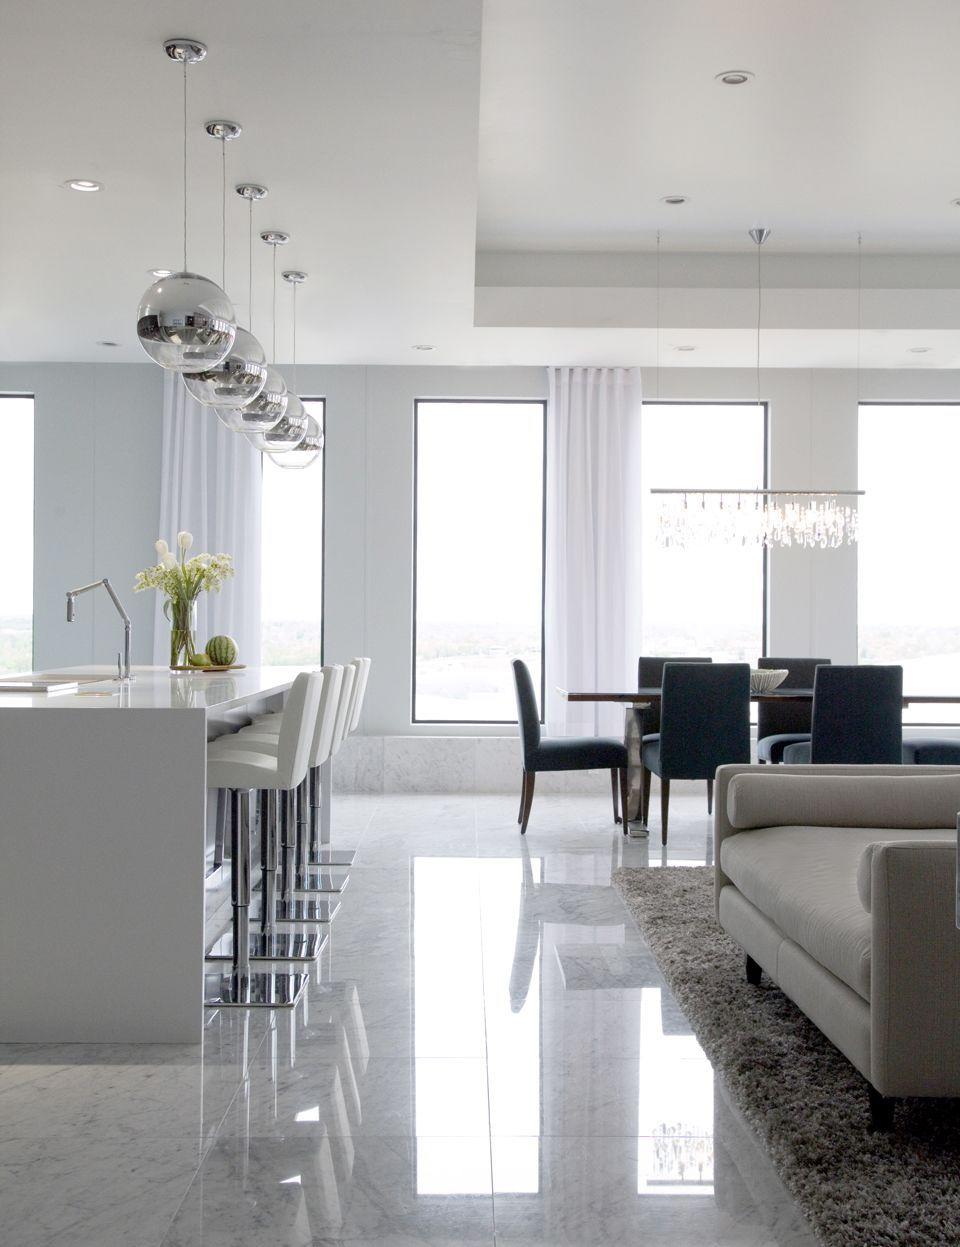 Great Room Modern Living Room Images By Threshold Goods Amp Design Llc Wayfair House Interior Living Room And Kitchen Design Minimalist Living Room